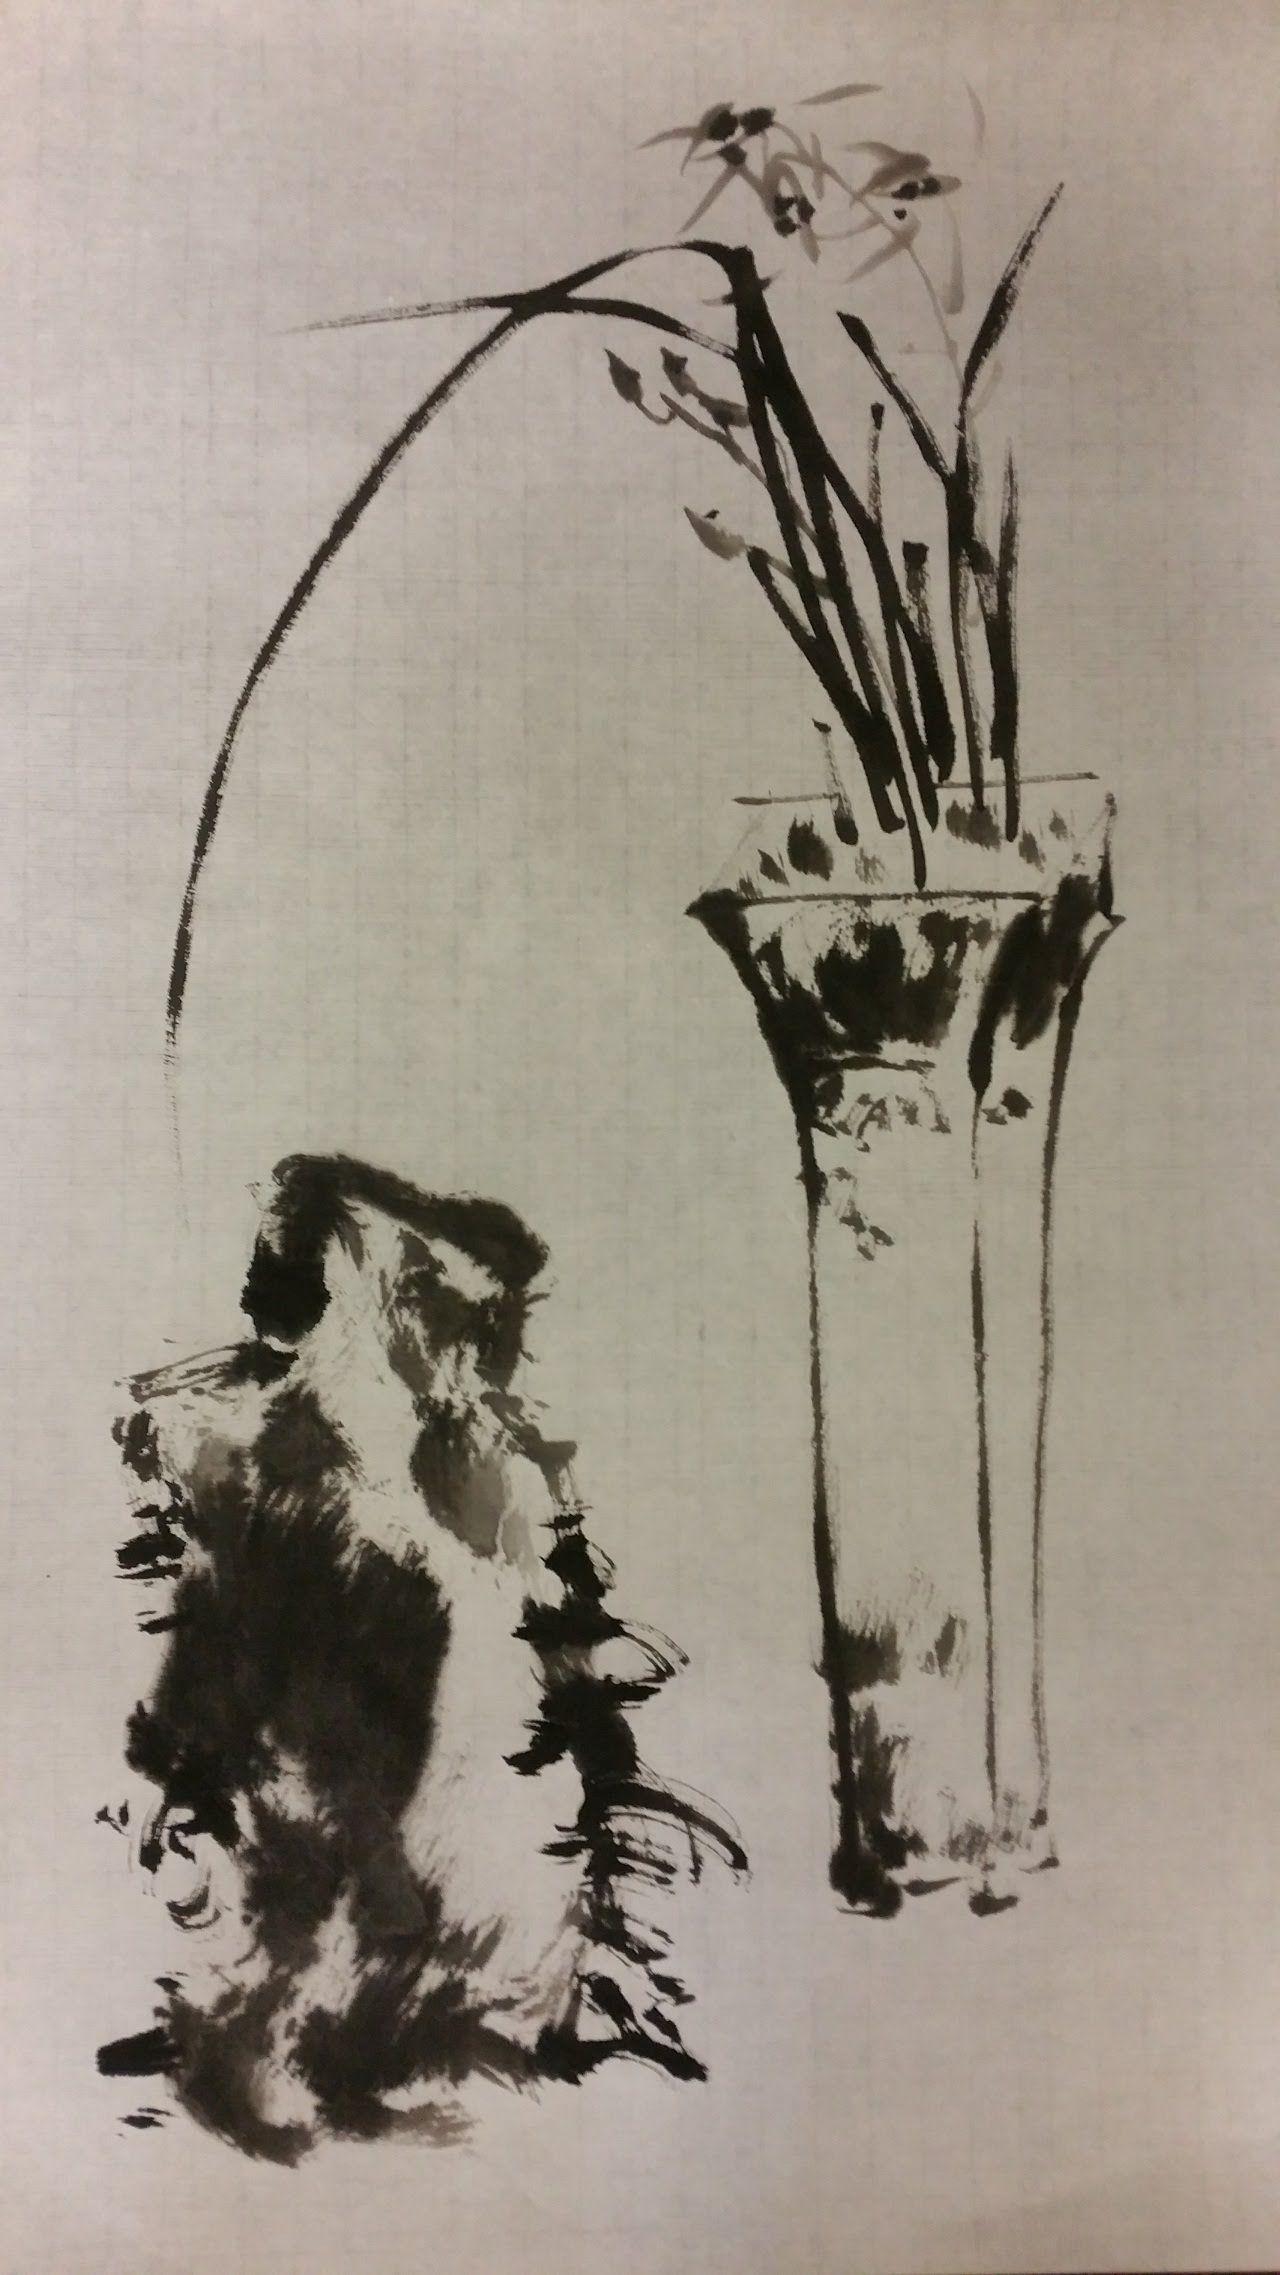 Korean Brush Painting (12) Orchid (소현의 난초 그리기) 世界朝鮮風